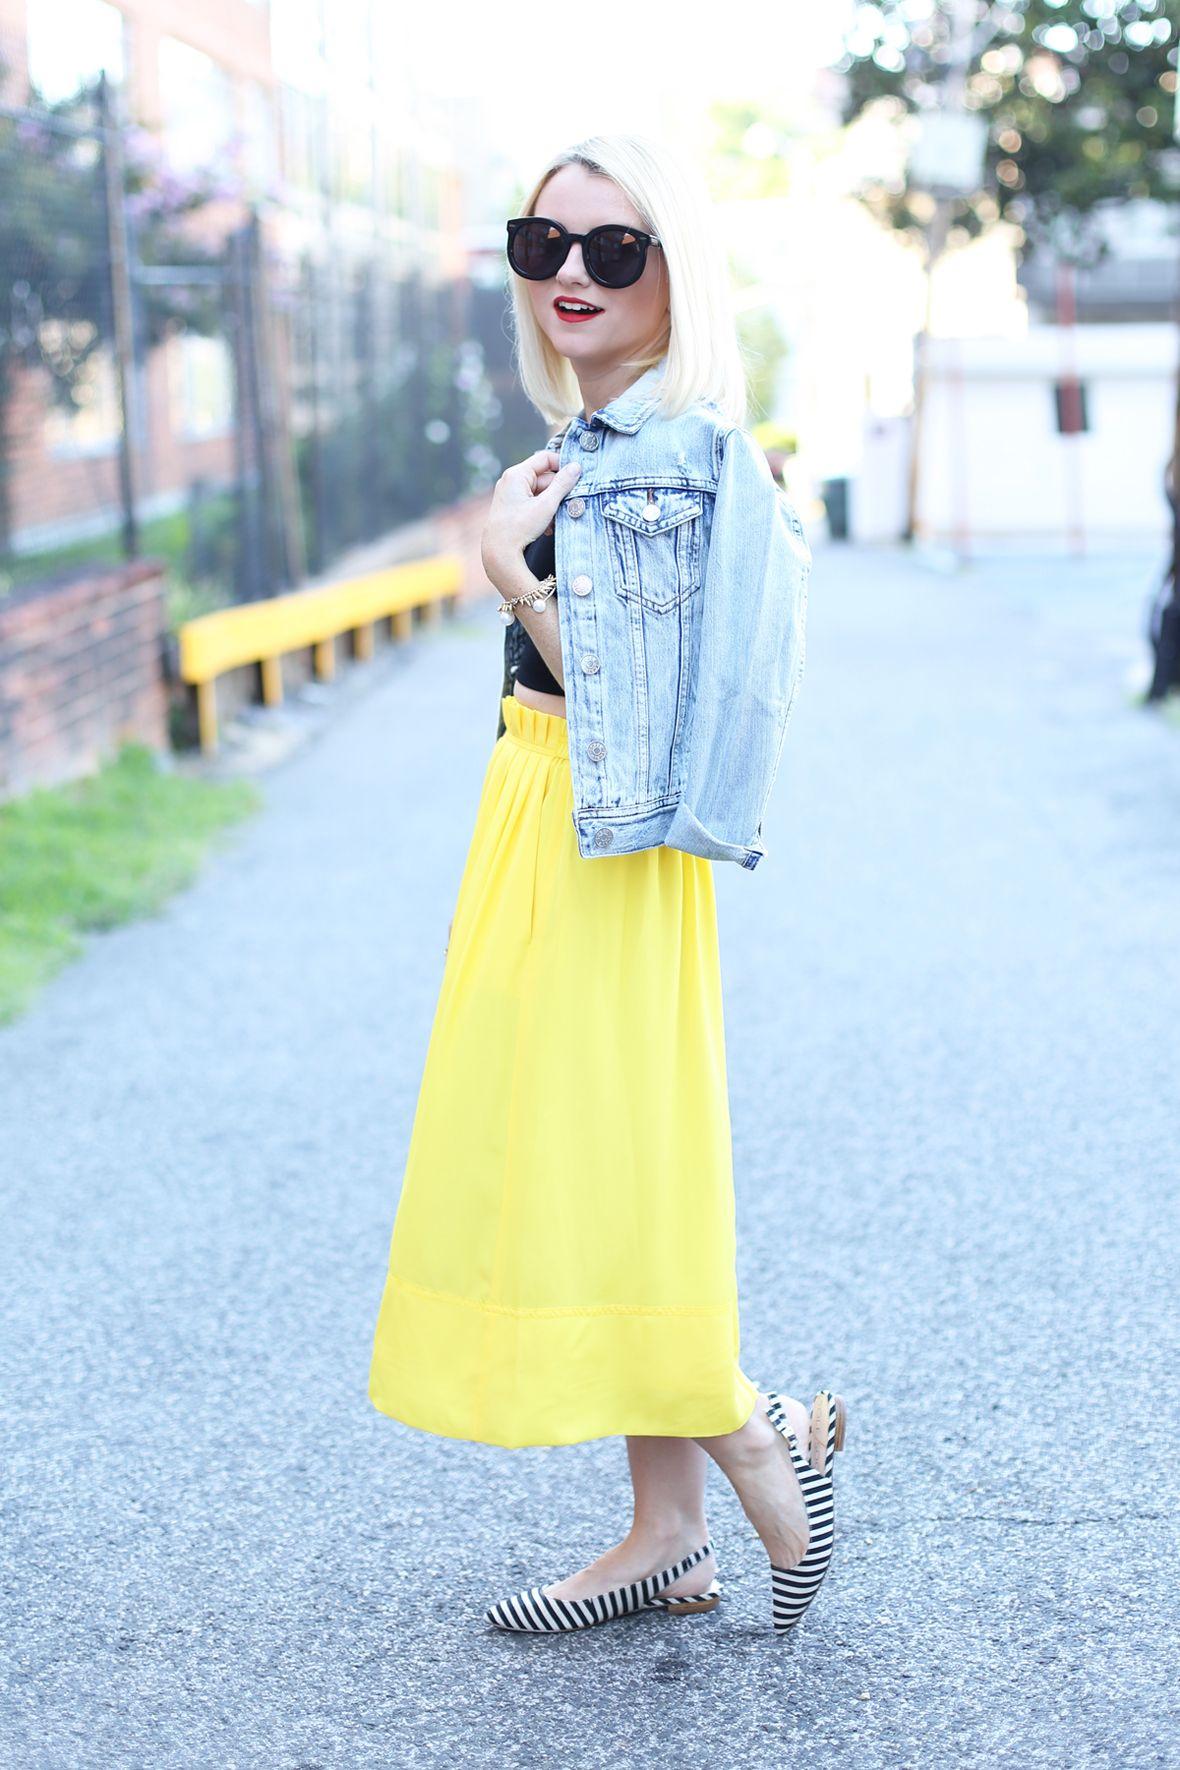 Yellow Midi Skirt and Denim Jacket on Poor Little It Girl - via @poorlilitgirl